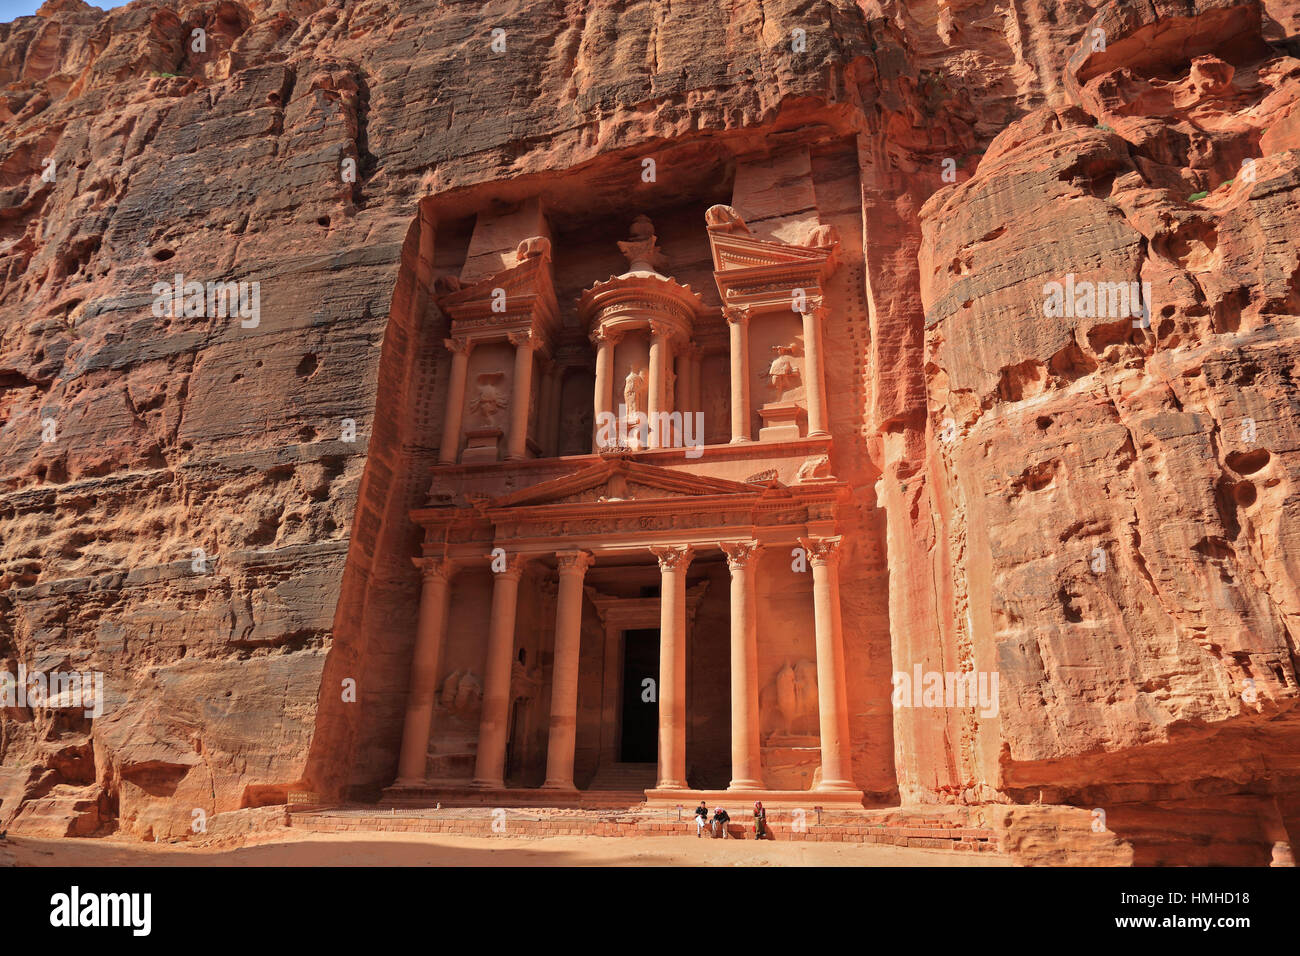 The Khazne al-Firaun, Chaznat al-Firaun, Al-Khazneh, treasure house of the Pharaoh, a mausoleum struck from the rock, abandoned rock city Petra, al-Ba Stock Photo